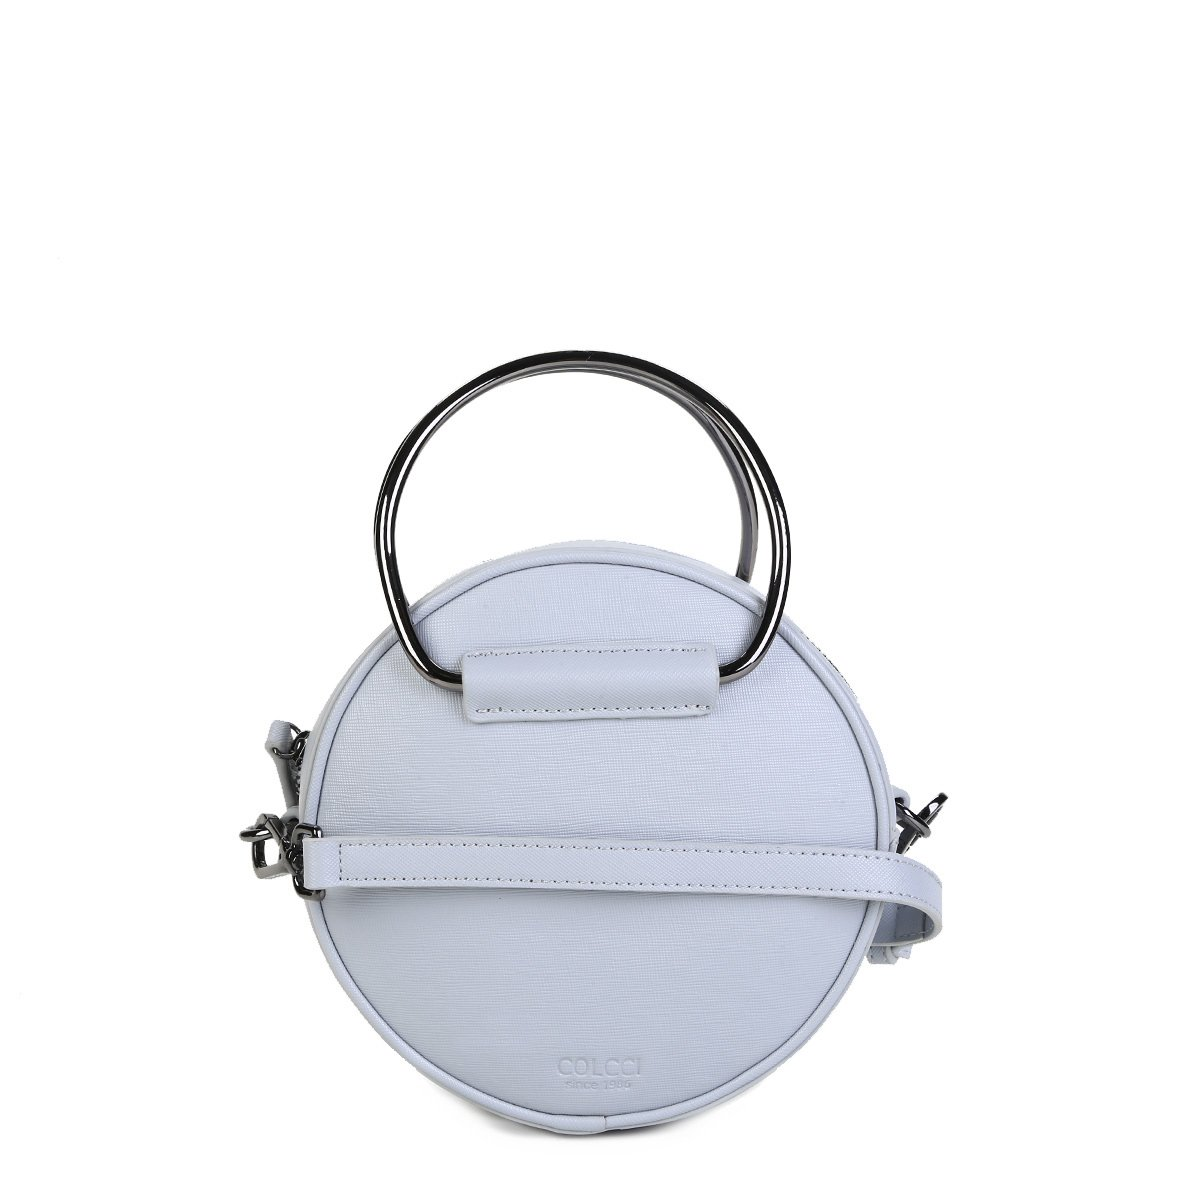 4cb85c6d4 Bolsa Redonda Colcci Mini Bag Detalhe Argola Alça Transversal Feminina